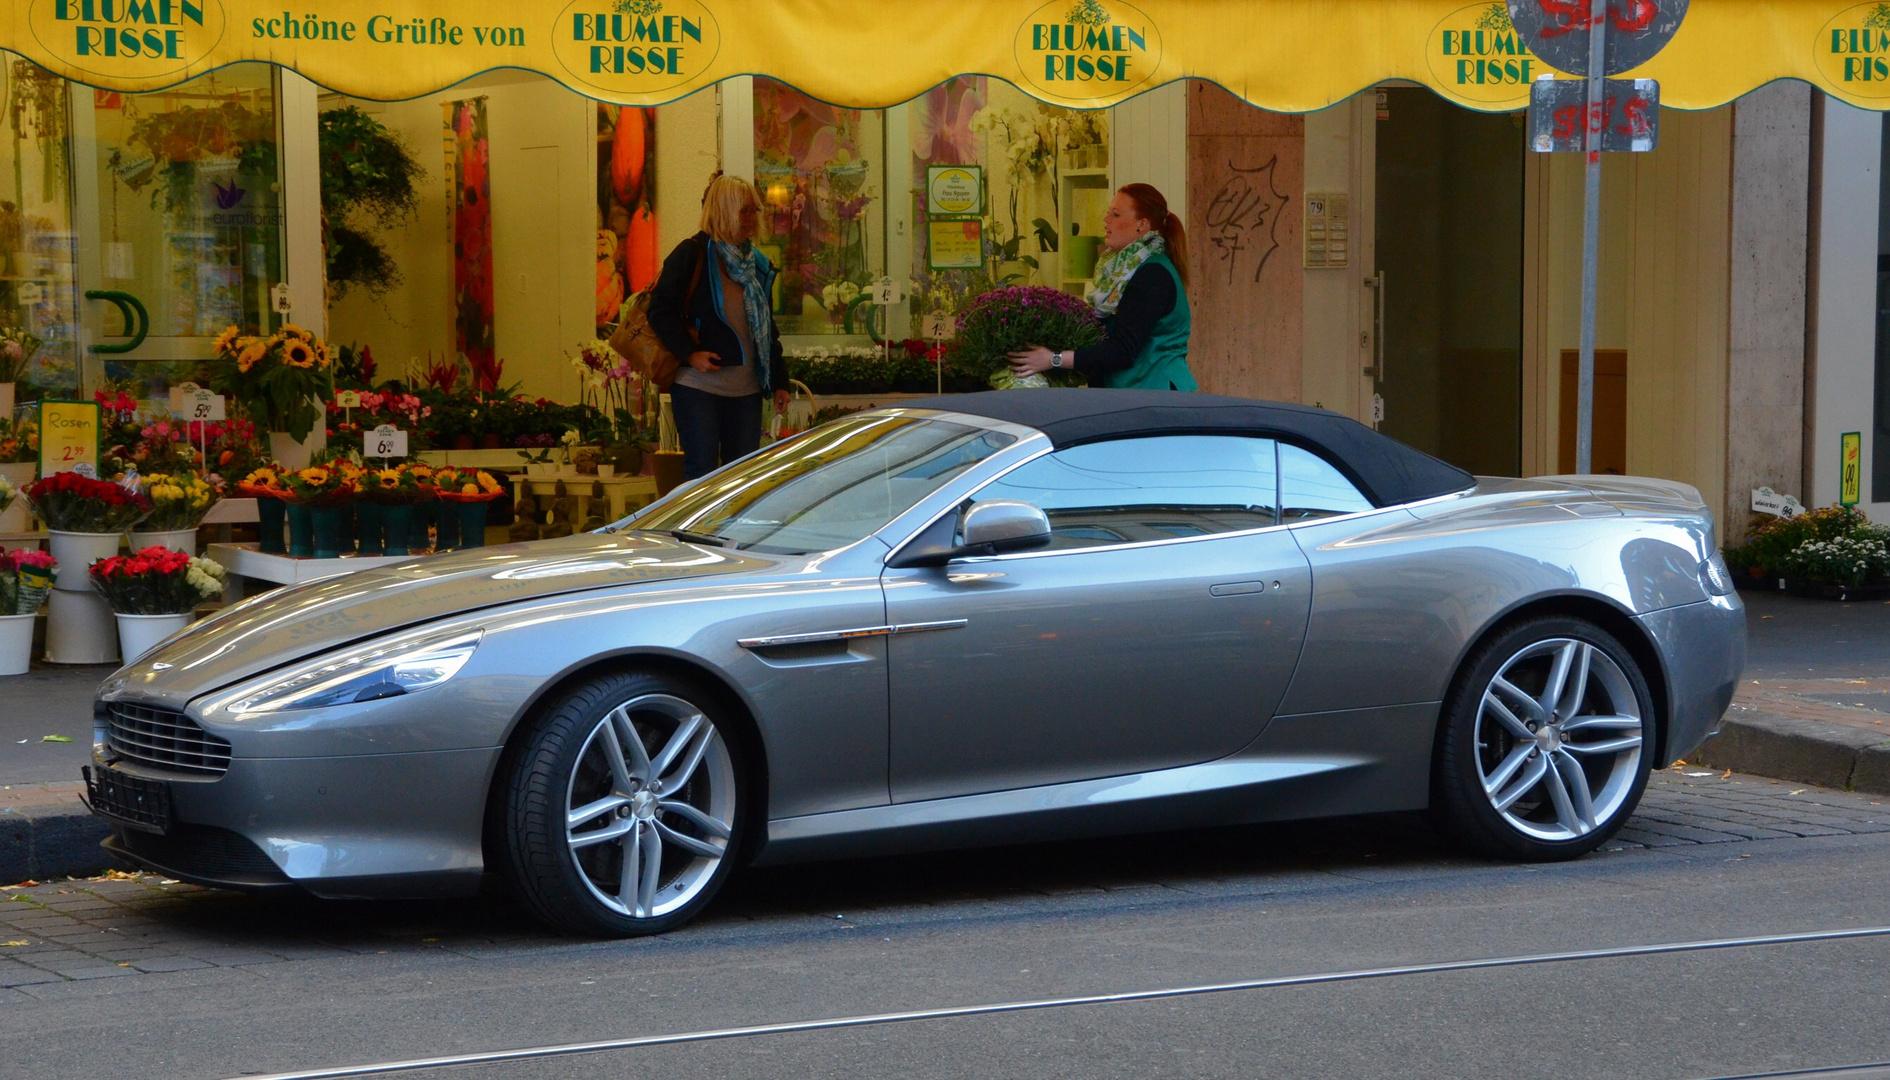 Aston Martin DB 9 (nigelnagelneu)